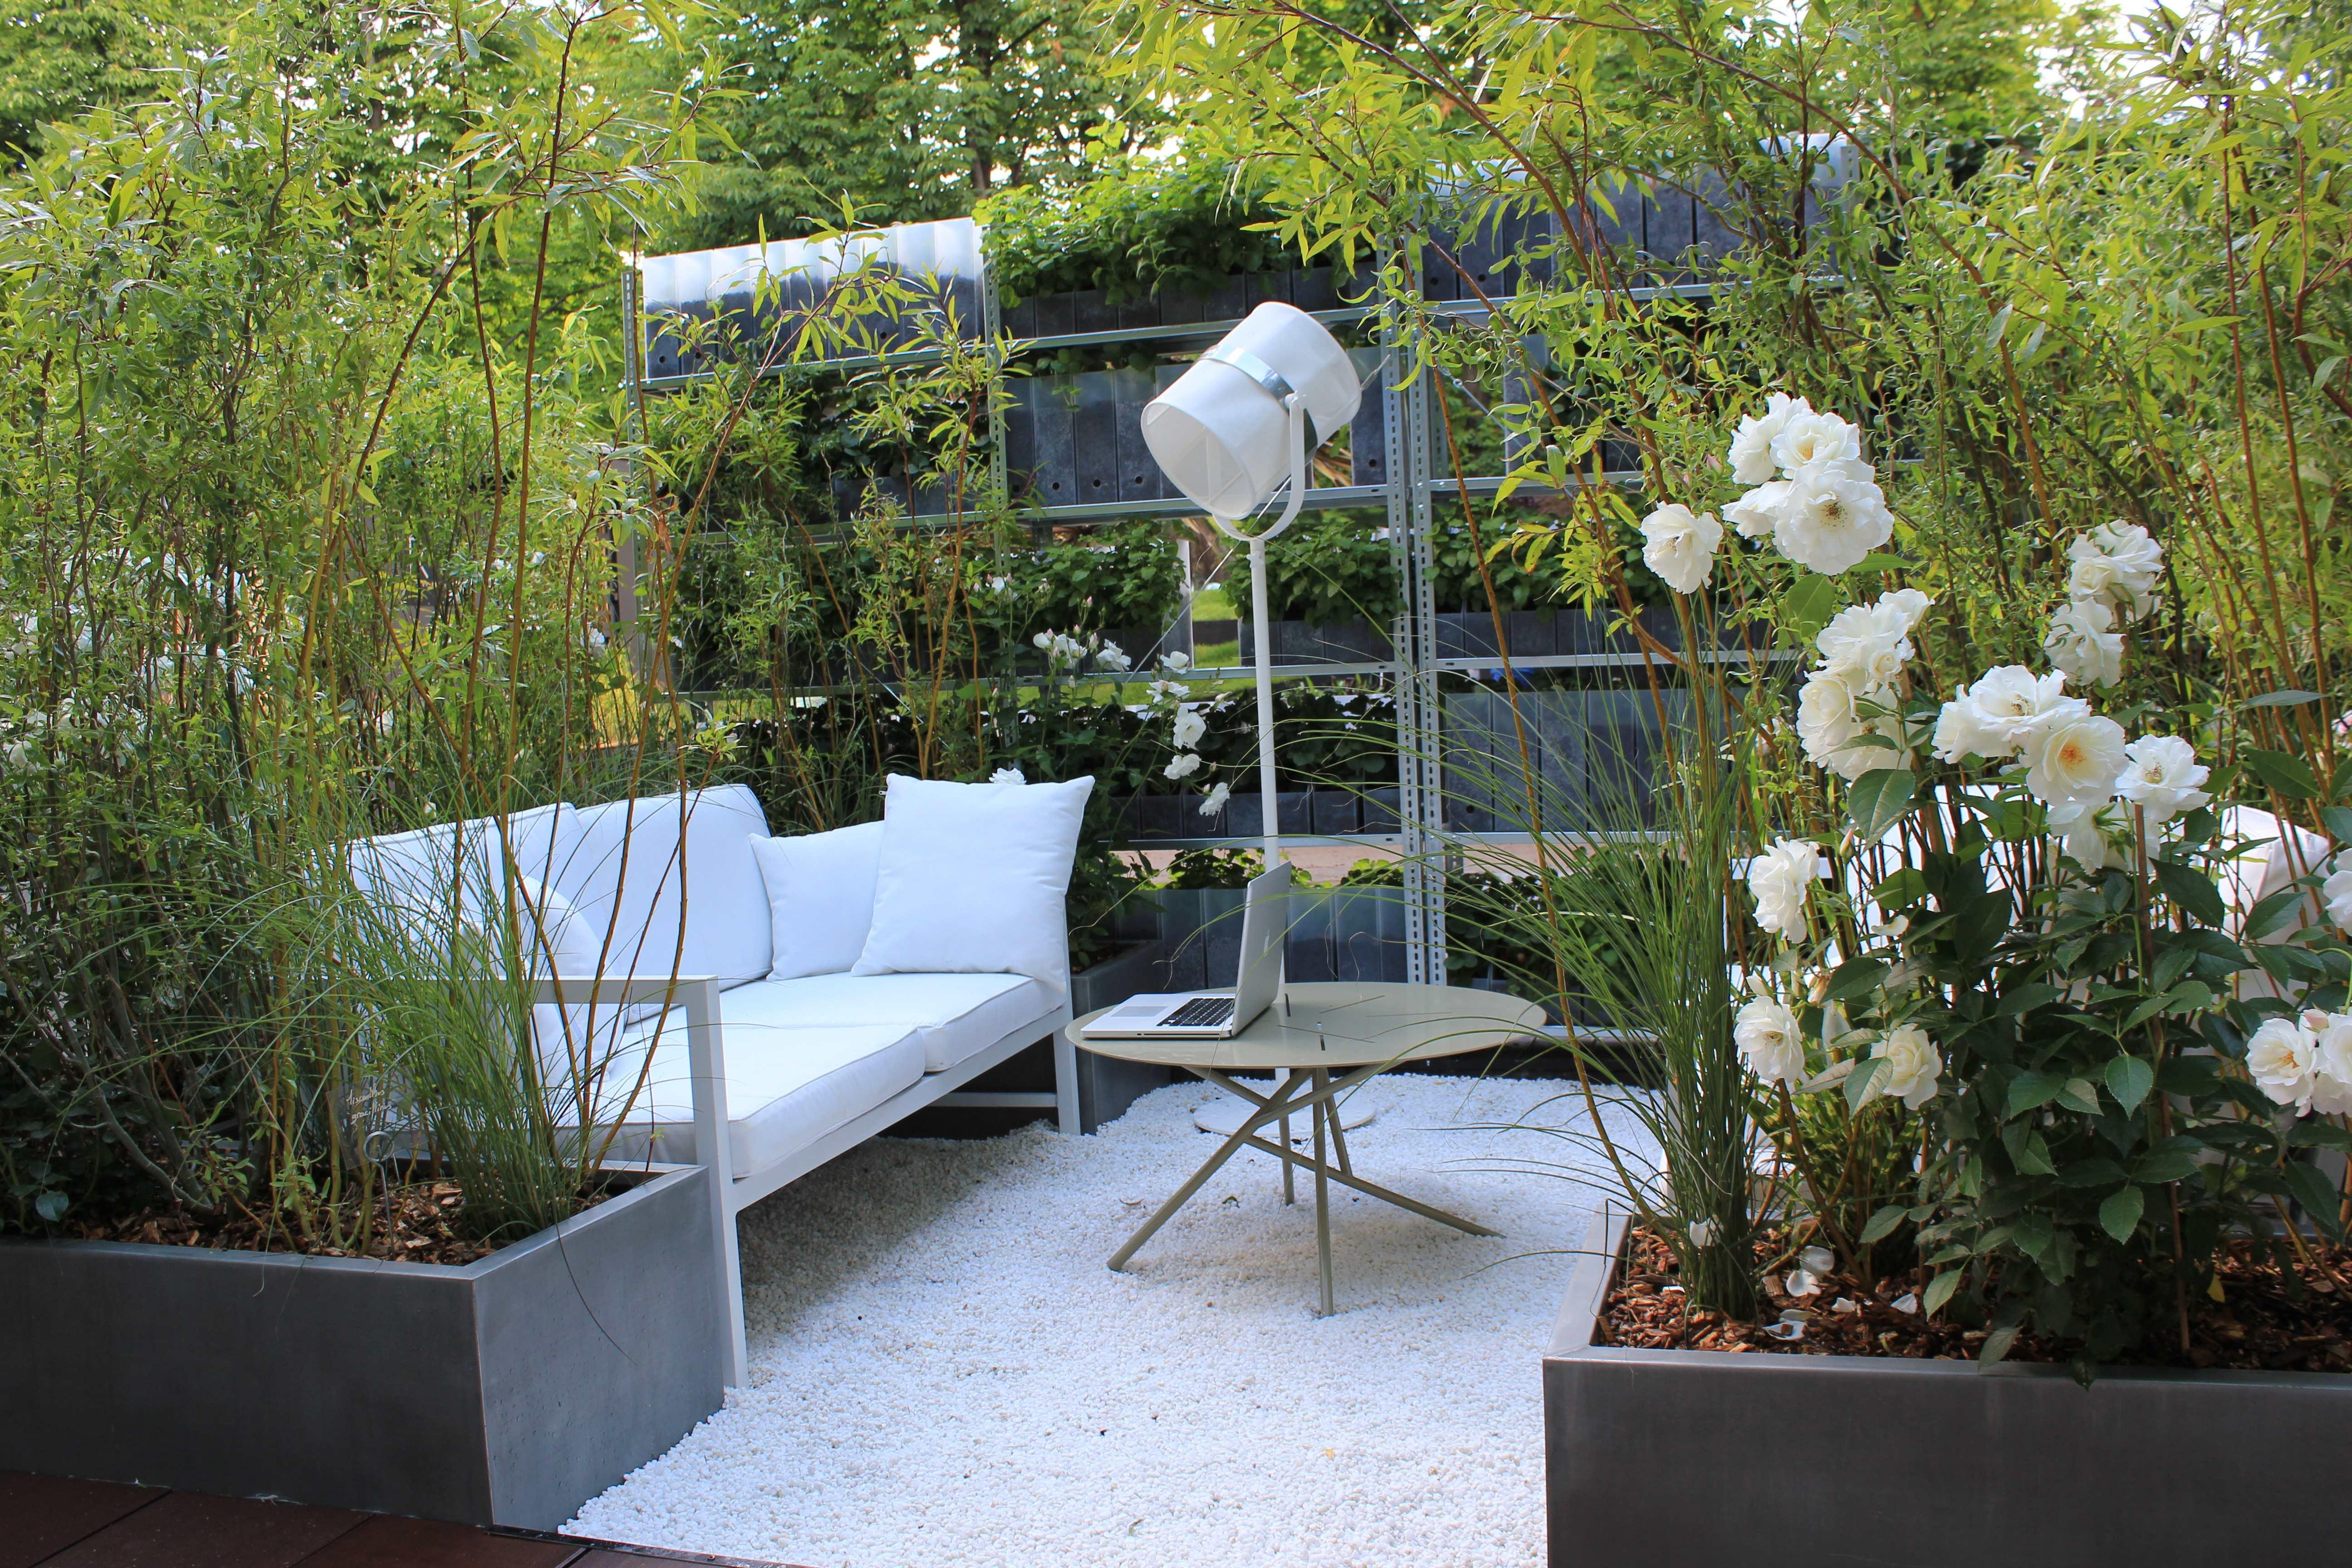 les jardins de gally passer de l 39 espace vert l 39 espace. Black Bedroom Furniture Sets. Home Design Ideas